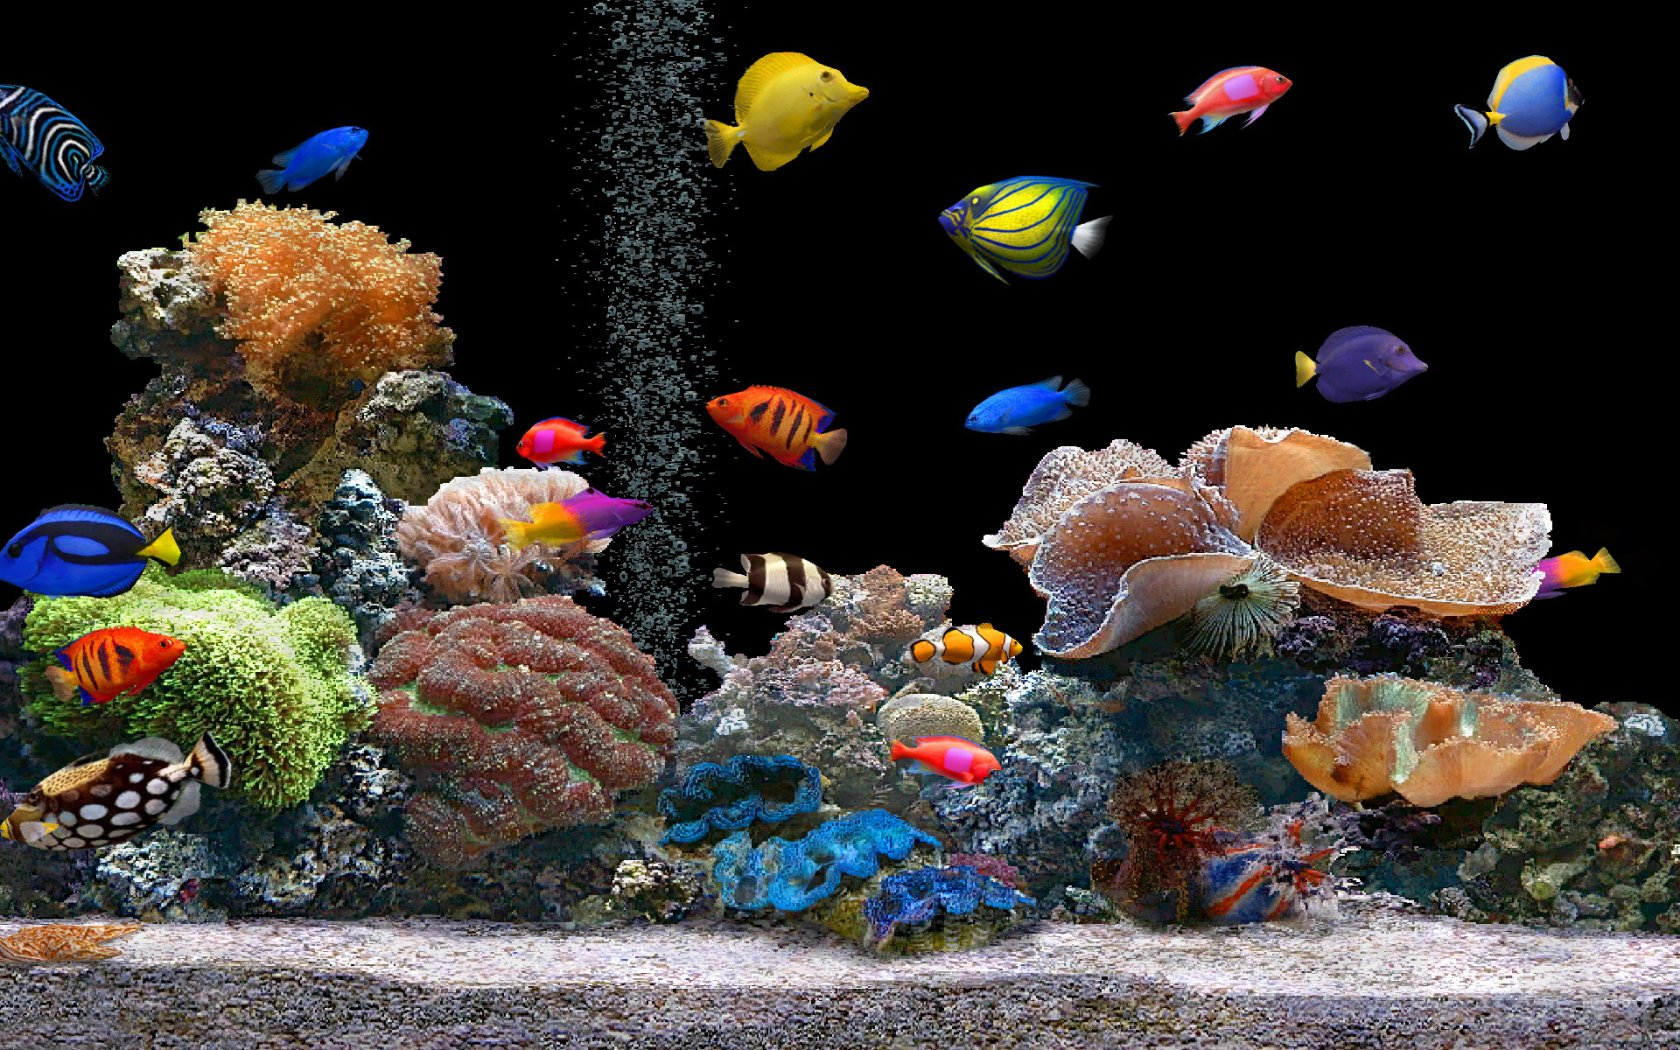 Aquarium Wallpaper   haddenqhawkinsons 123 blog 1680x1050